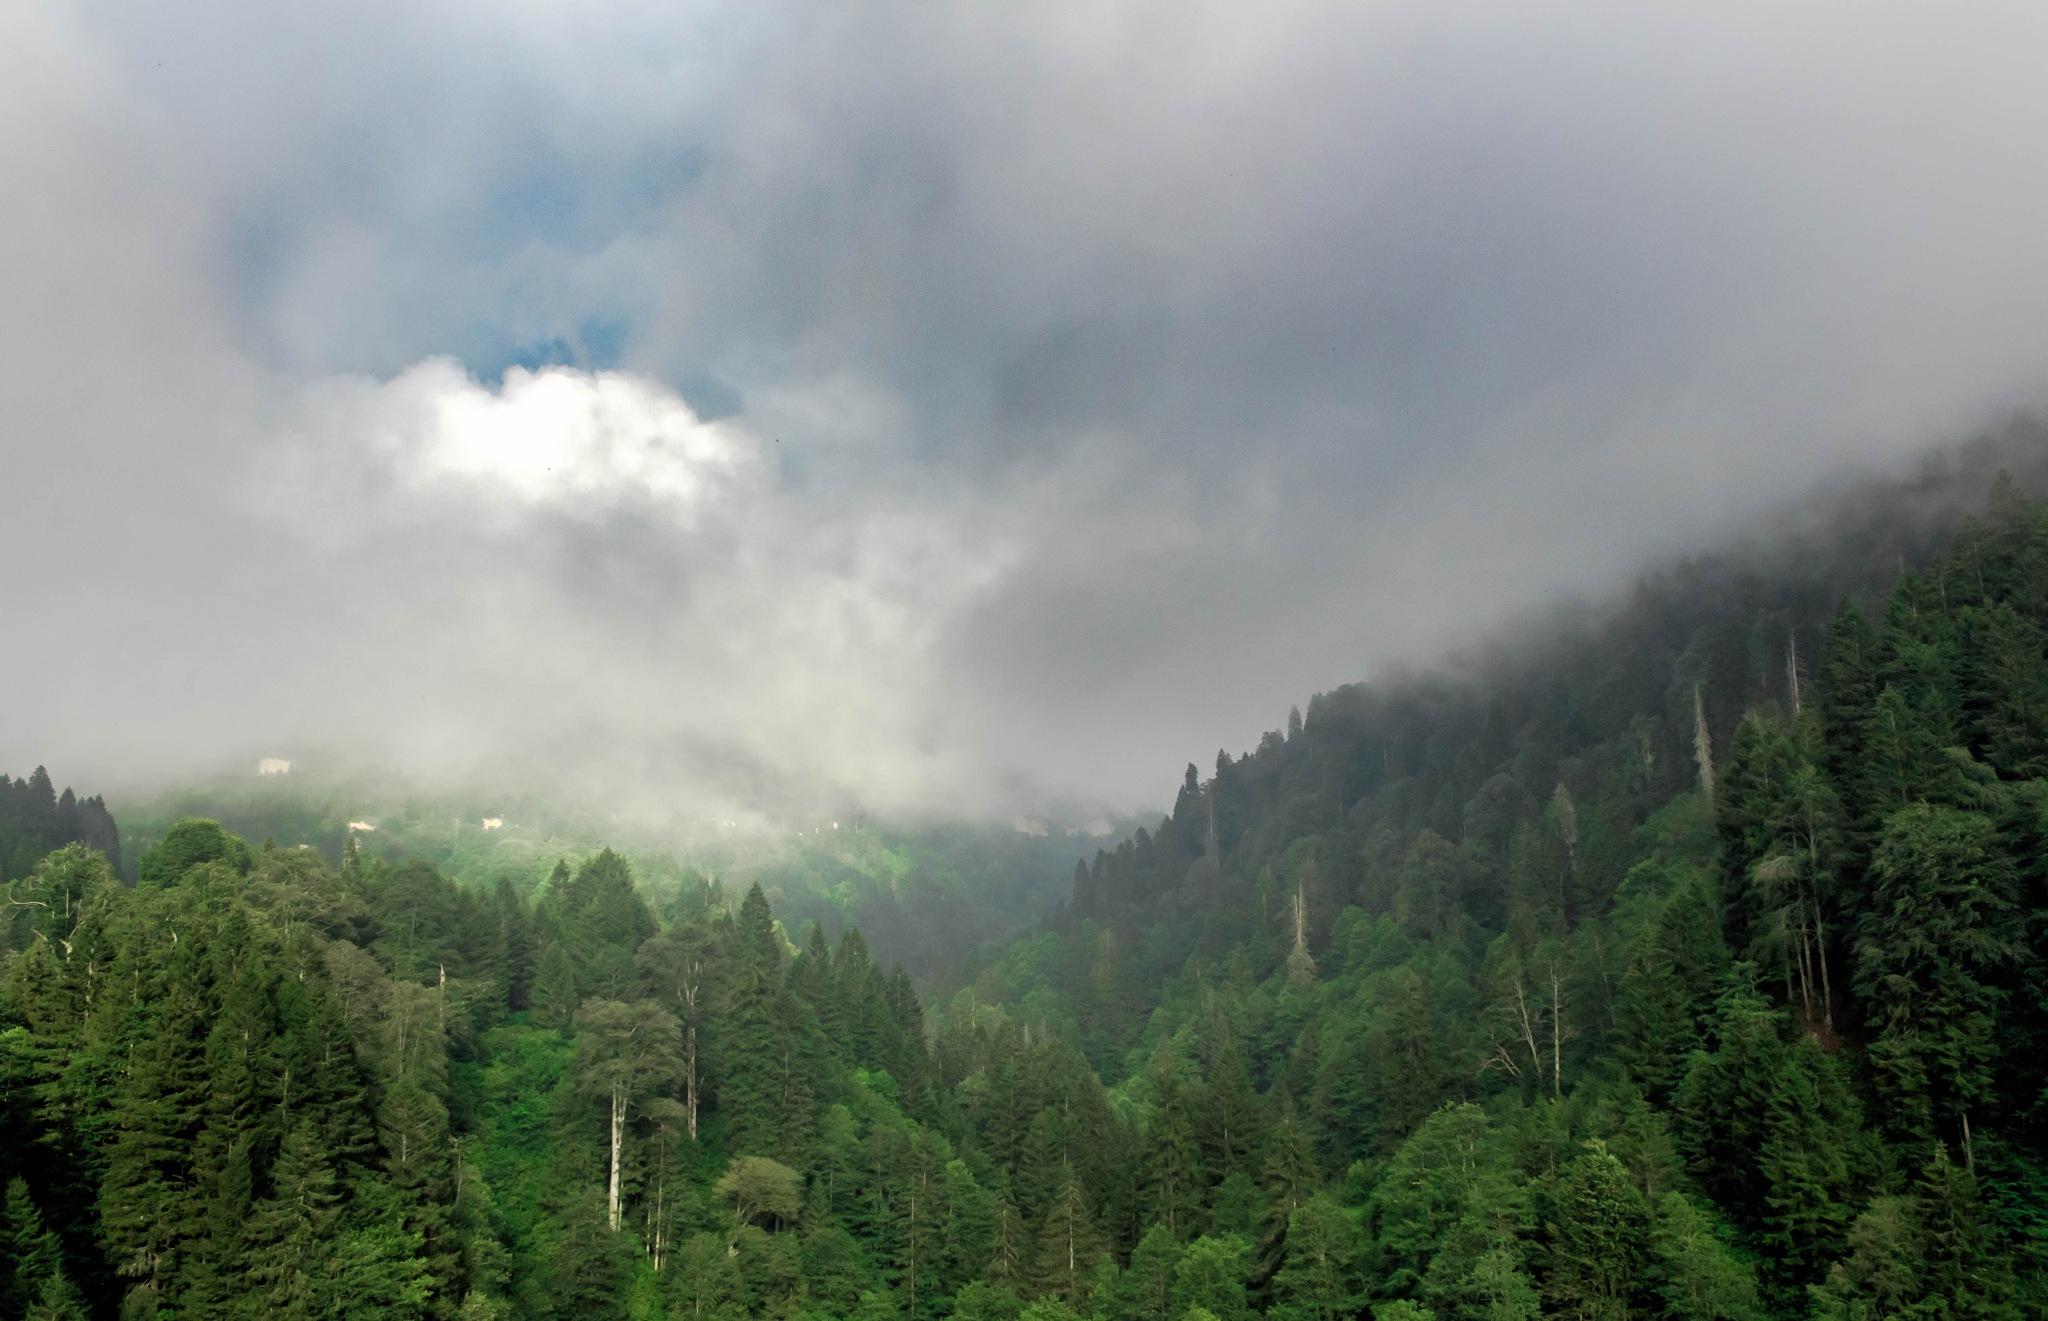 When Blue Takes a Peek Through the Clouds by C. Sinan Altundag